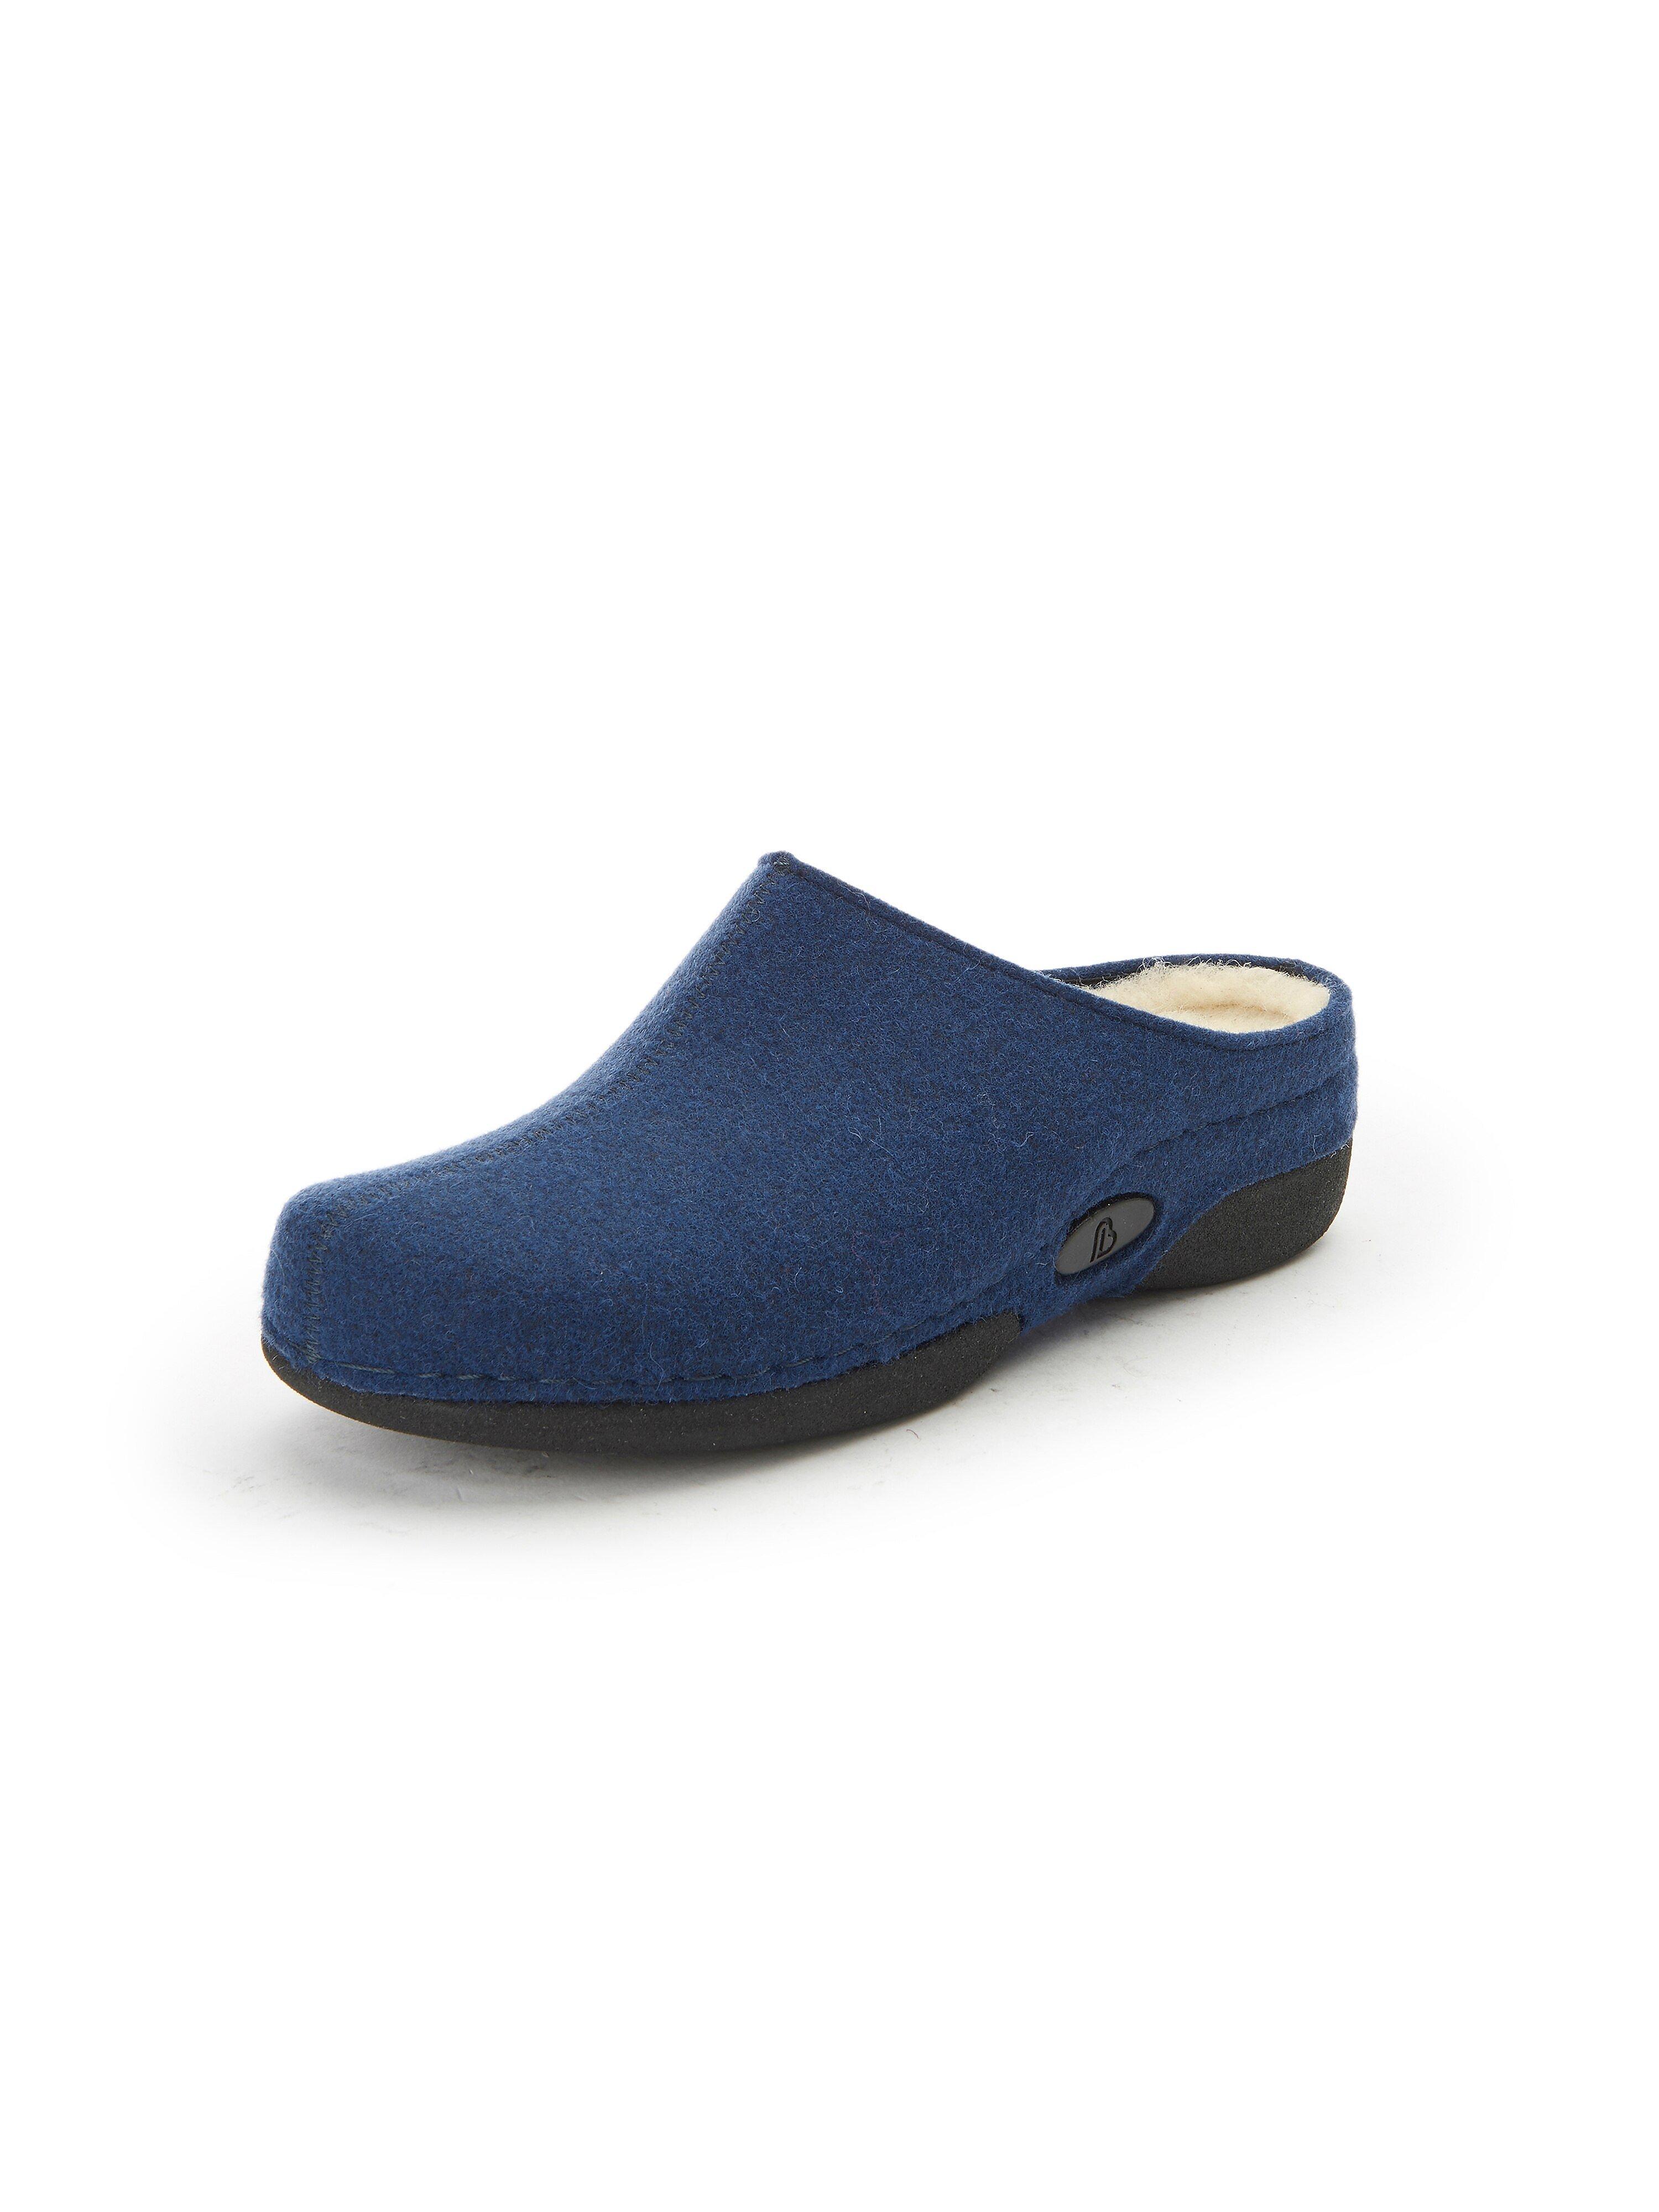 Pantoffels Van Berkemann Original blauw